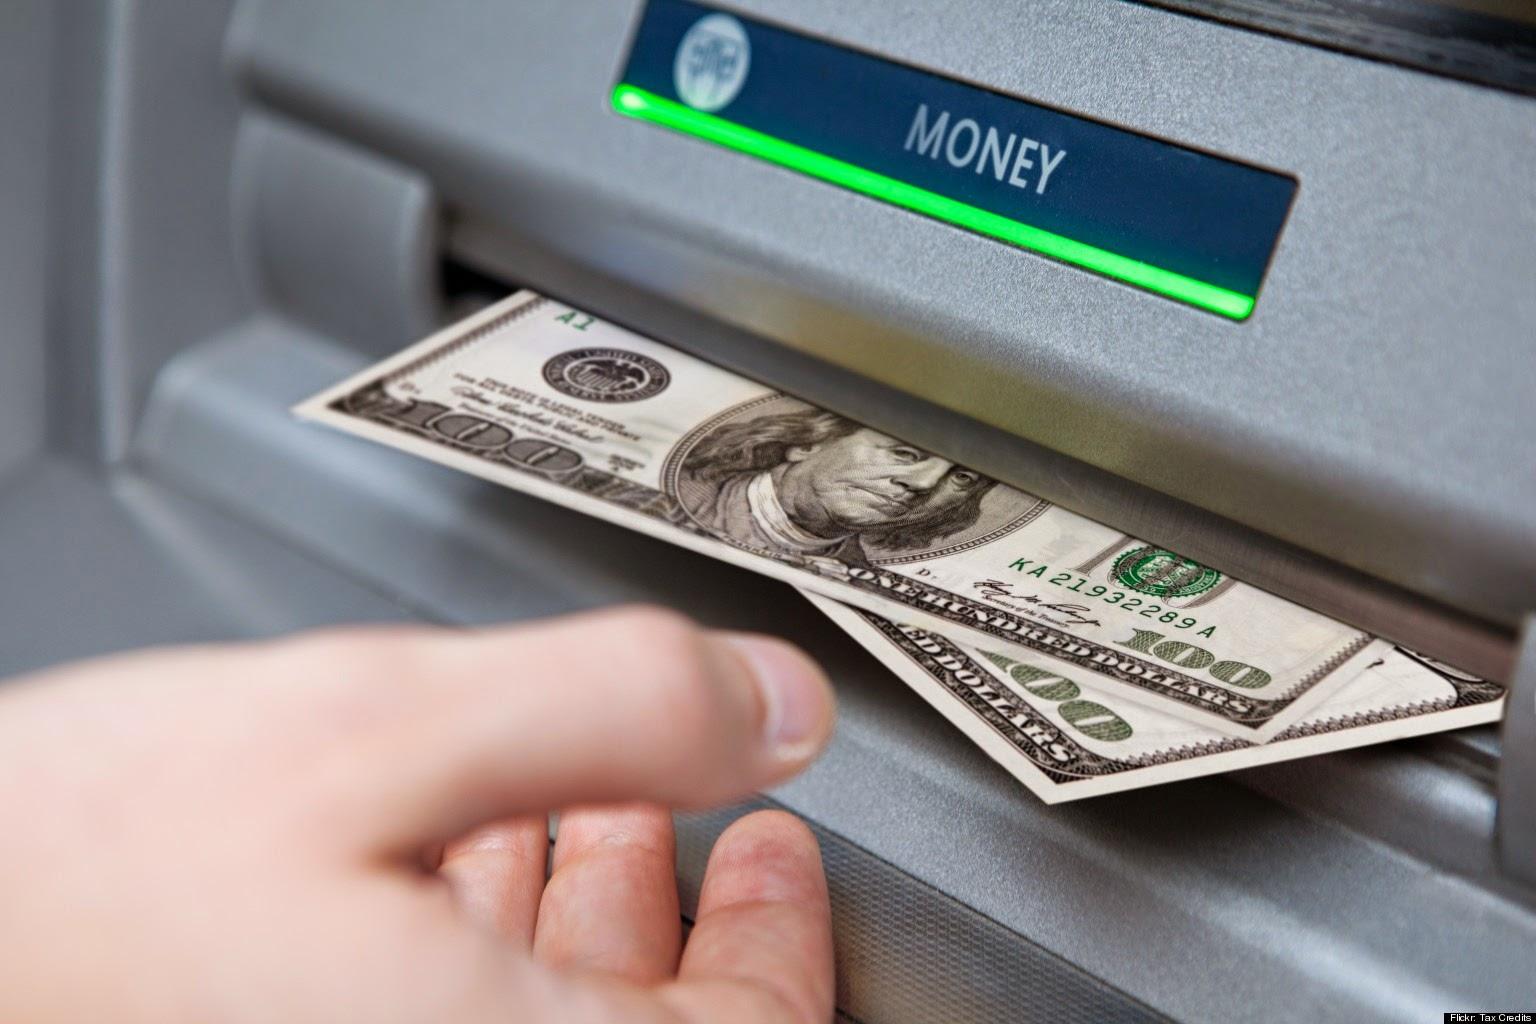 ' ' from the web at 'http://4.bp.blogspot.com/-91bHTV0eqFo/U5mg1q02ieI/AAAAAAAAcCI/3BYIjOi3L04/s1600/Students-Hack-ATM-during-School-Lunch-Break.jpg'